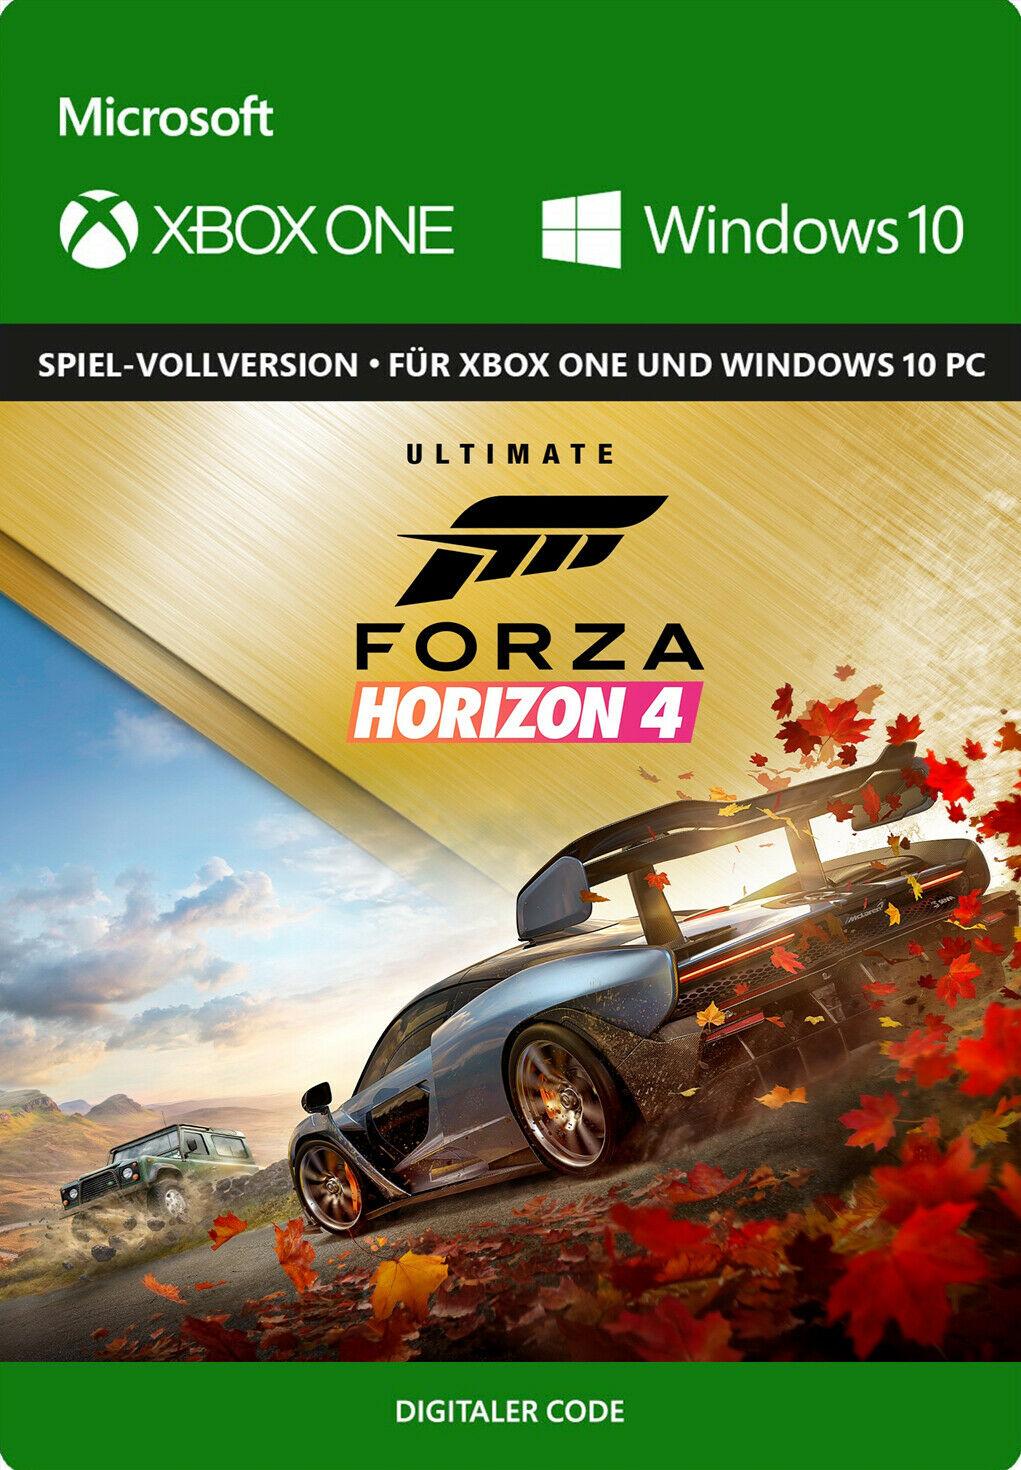 Forza Horizon 4 Ultimate Edition · Xbox One / Series X|S & Windows 10 PC · Microsoft Store Island